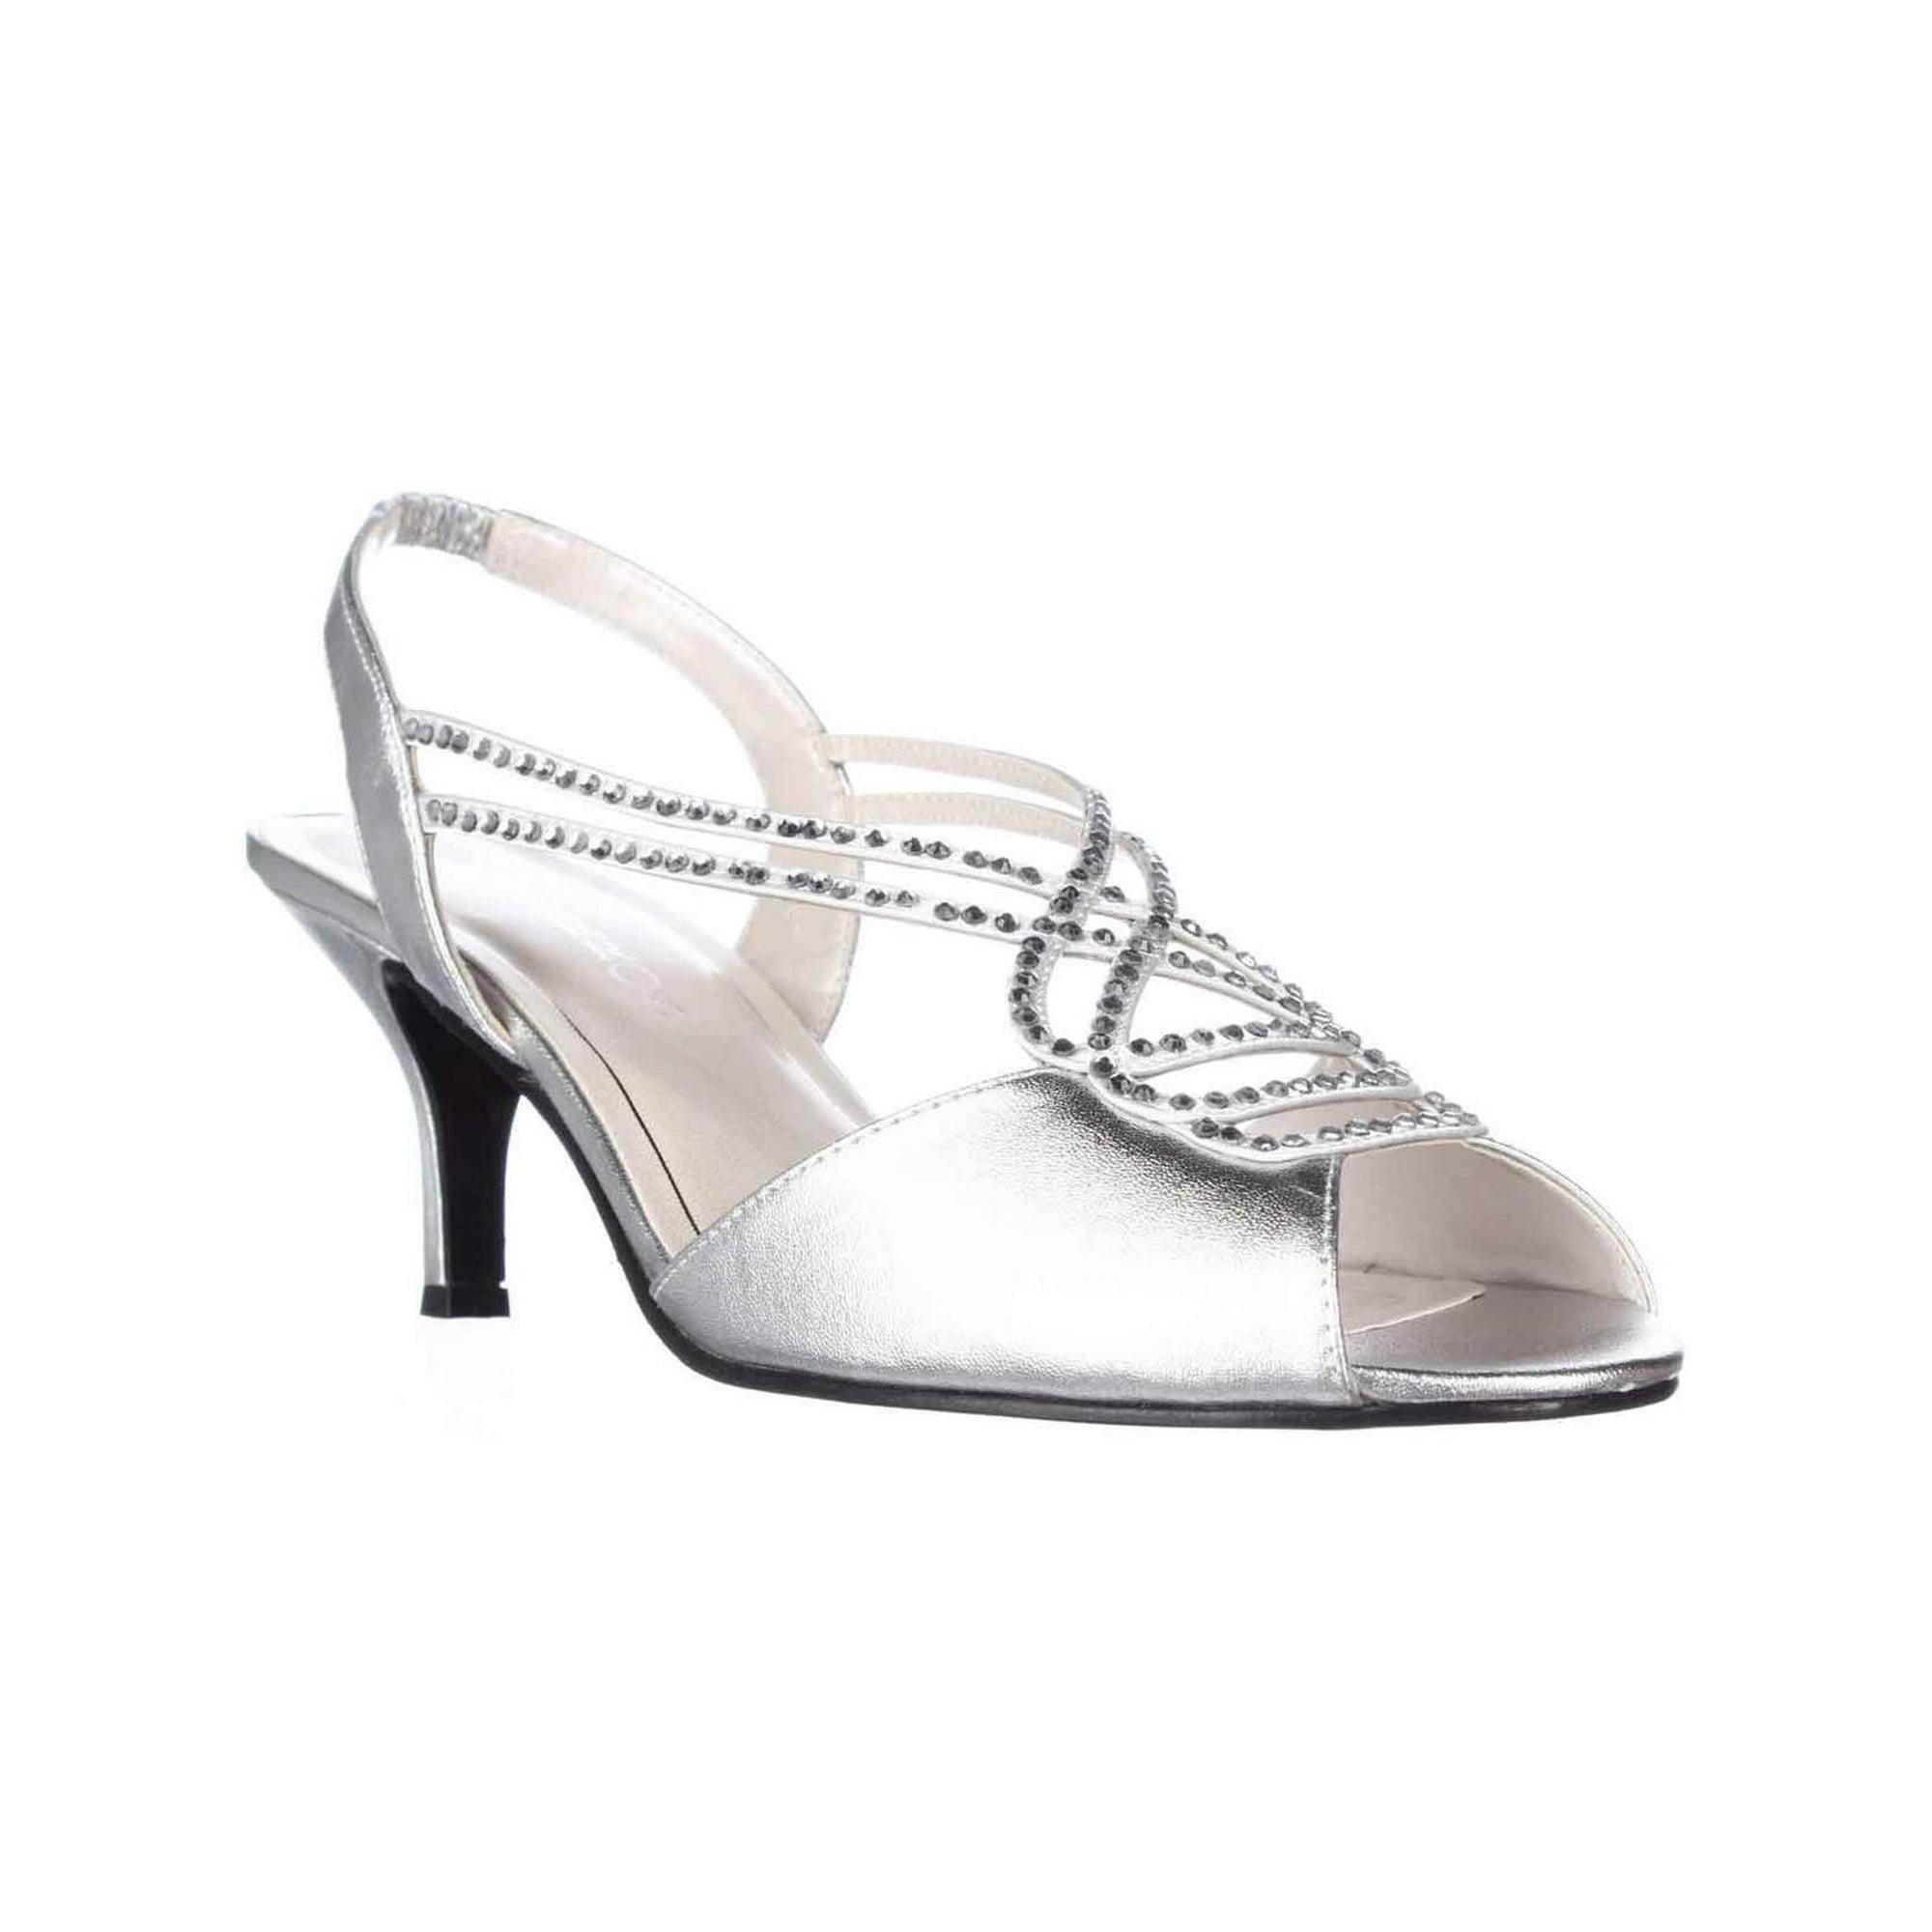 c04e6a875 Caparros Philomena Gemmed Slingback Dress Sandals